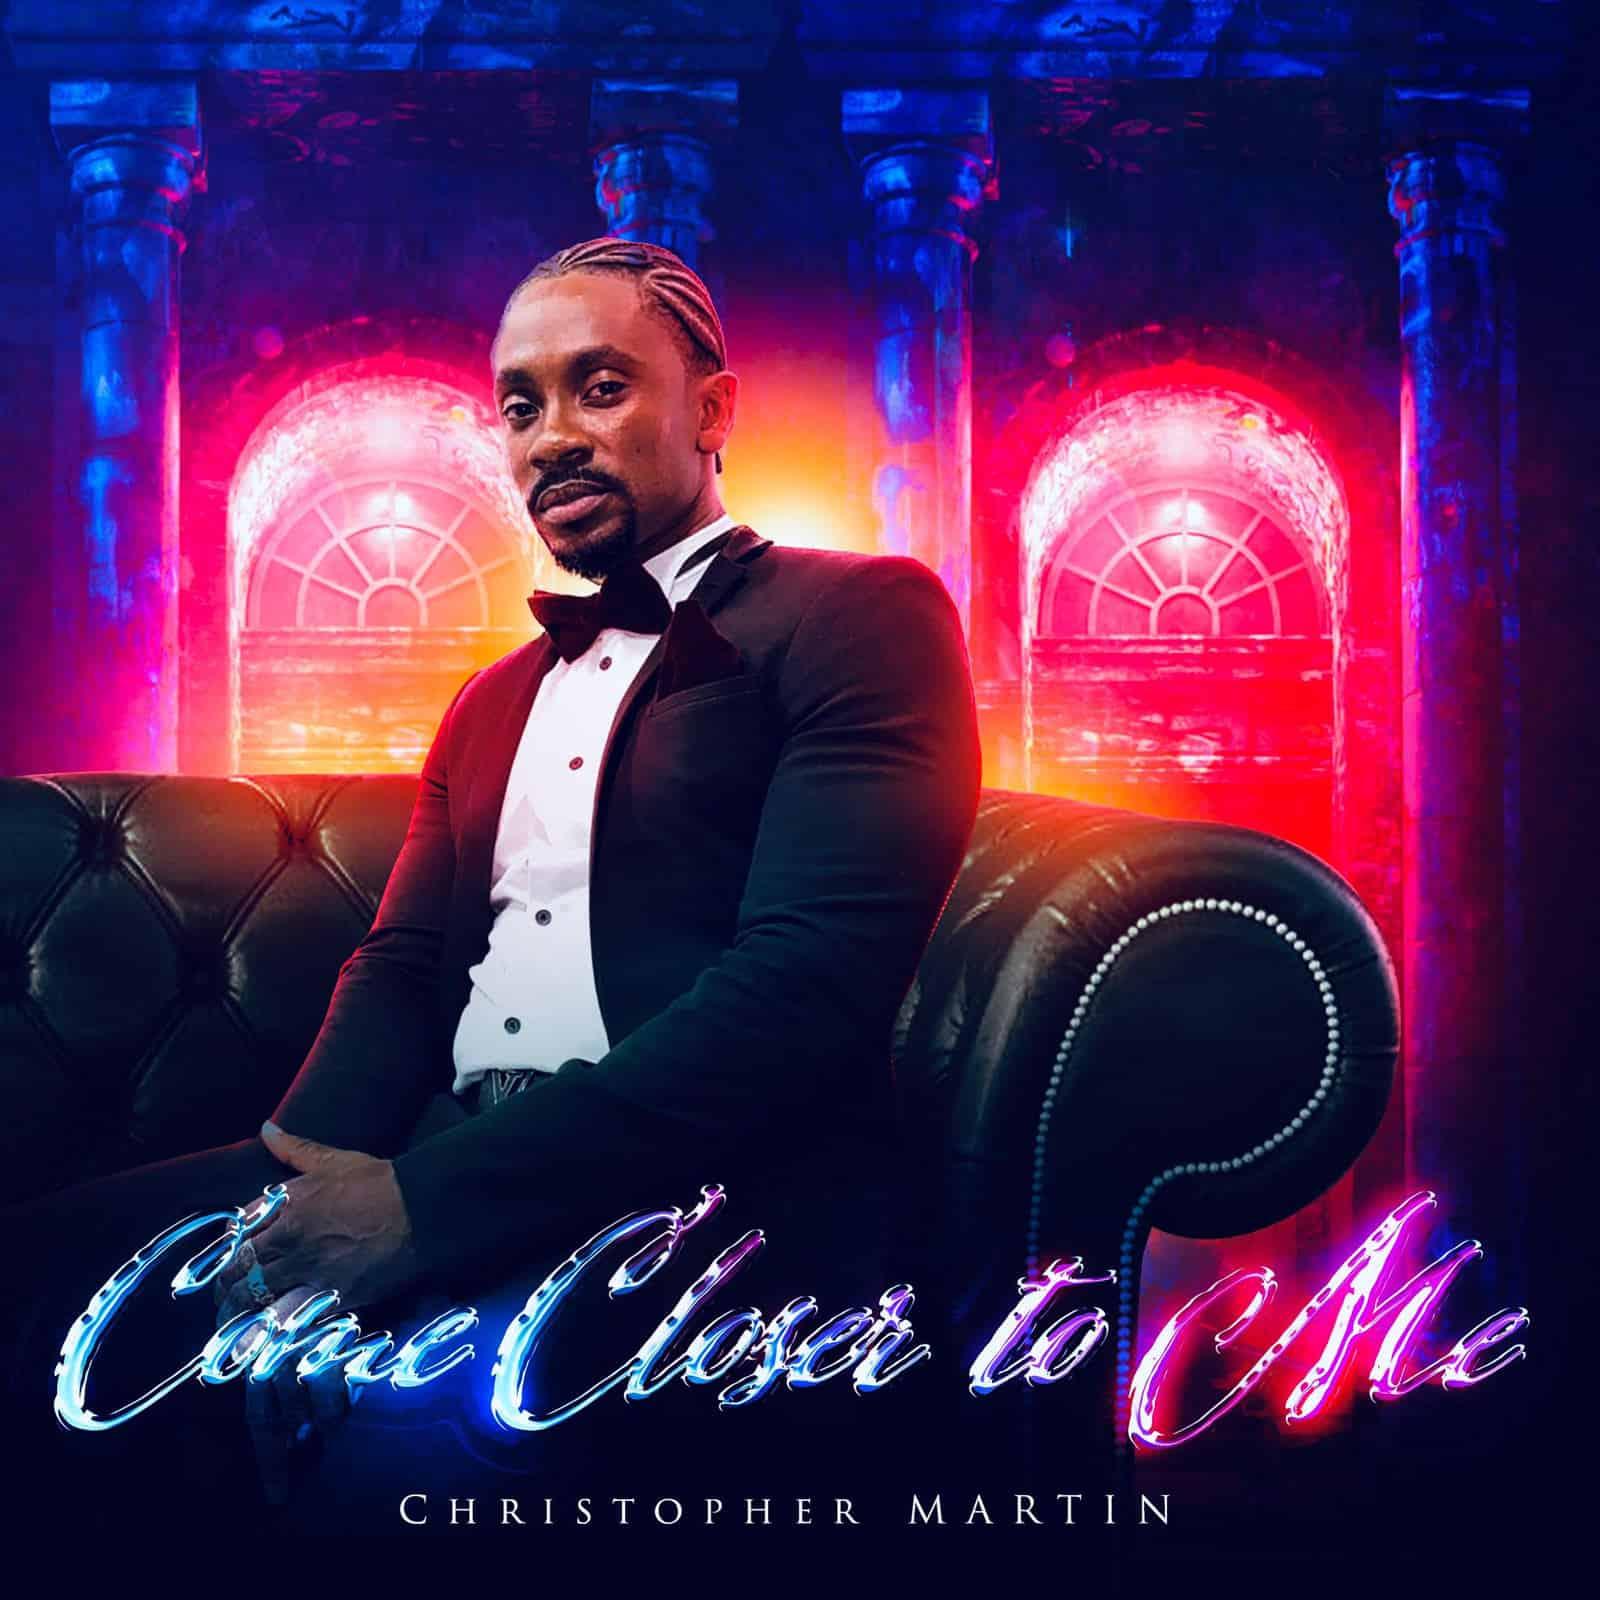 Christopher Martin - Come Closer to Me